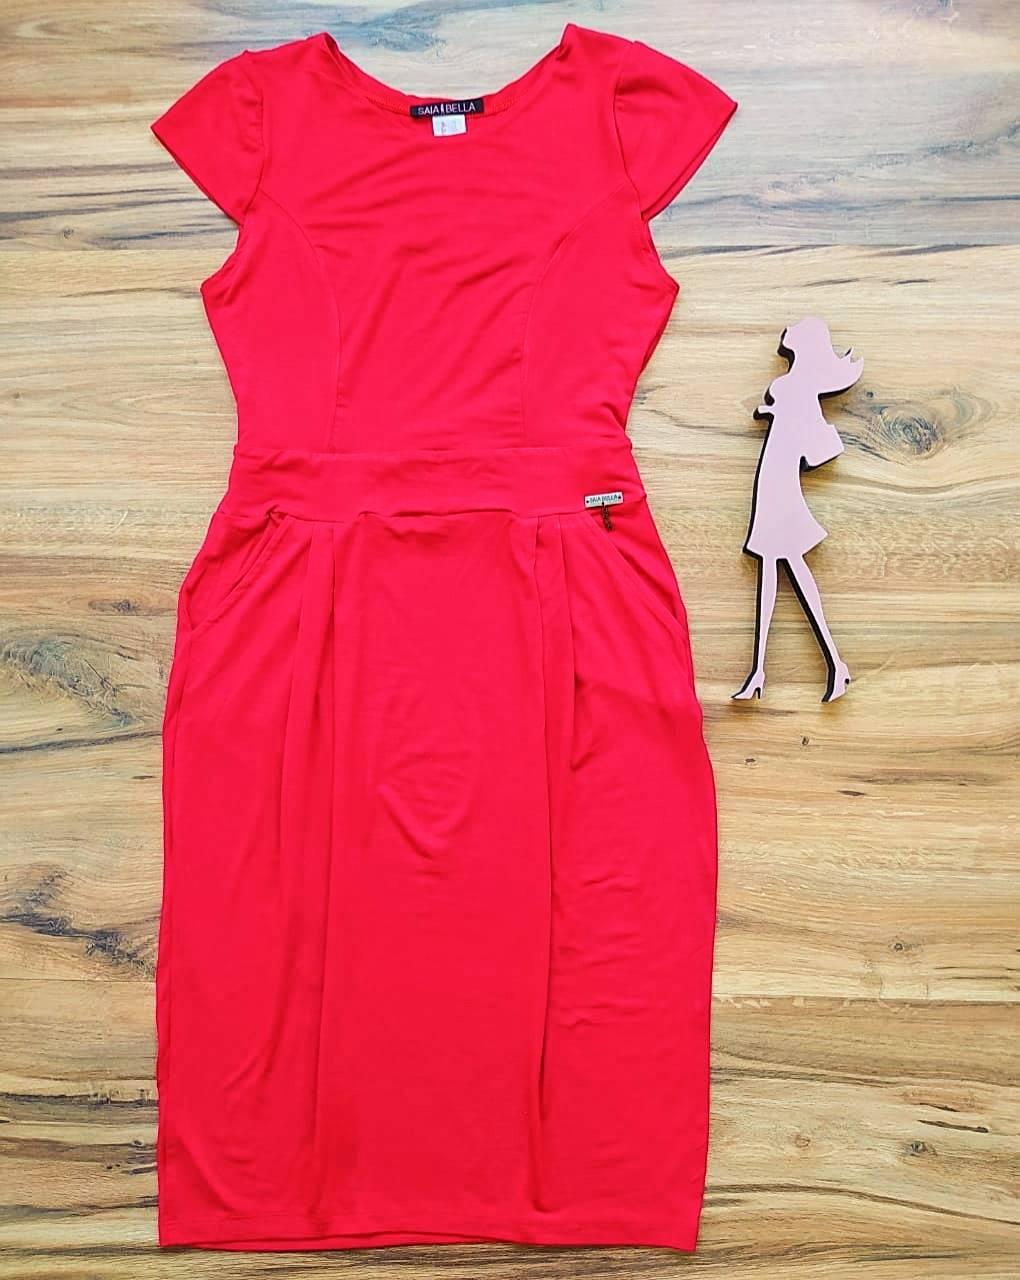 Vestido Polly modelo Reto Saia Bella SB3956  Vermelho